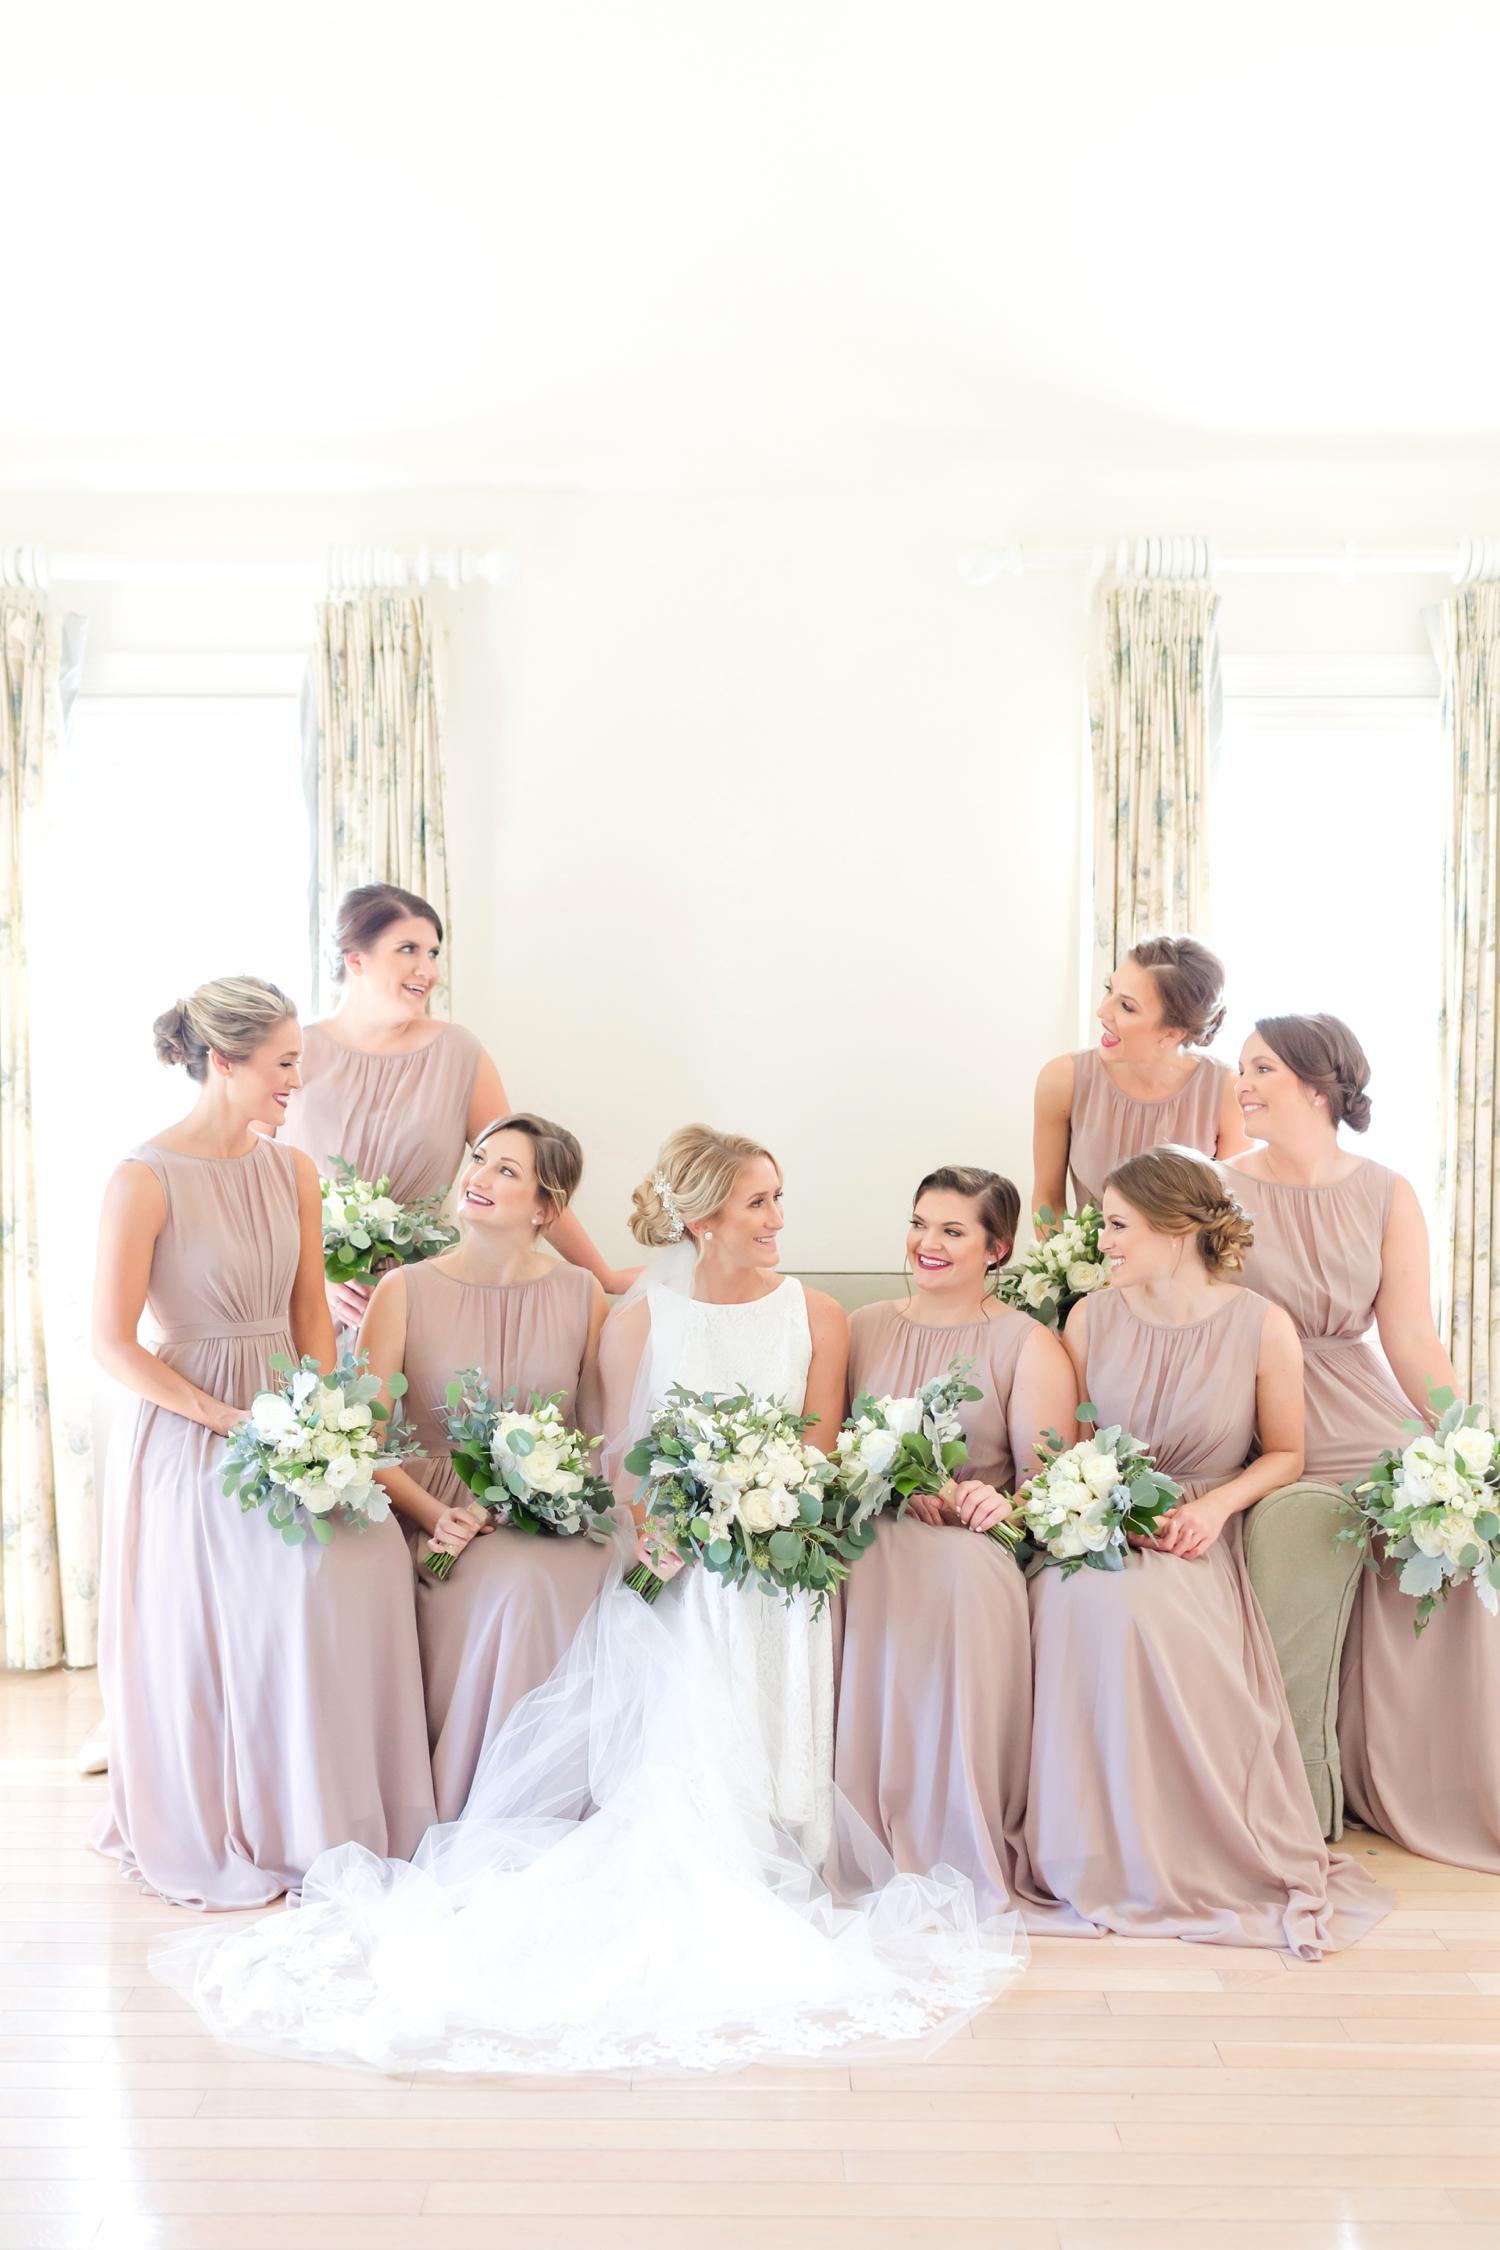 Wojciechowski Wedding-141_the-oaks-waterfront-inn-wedding-easton-maryland-wedding-photography-anna-grace-photography-photo.jpg